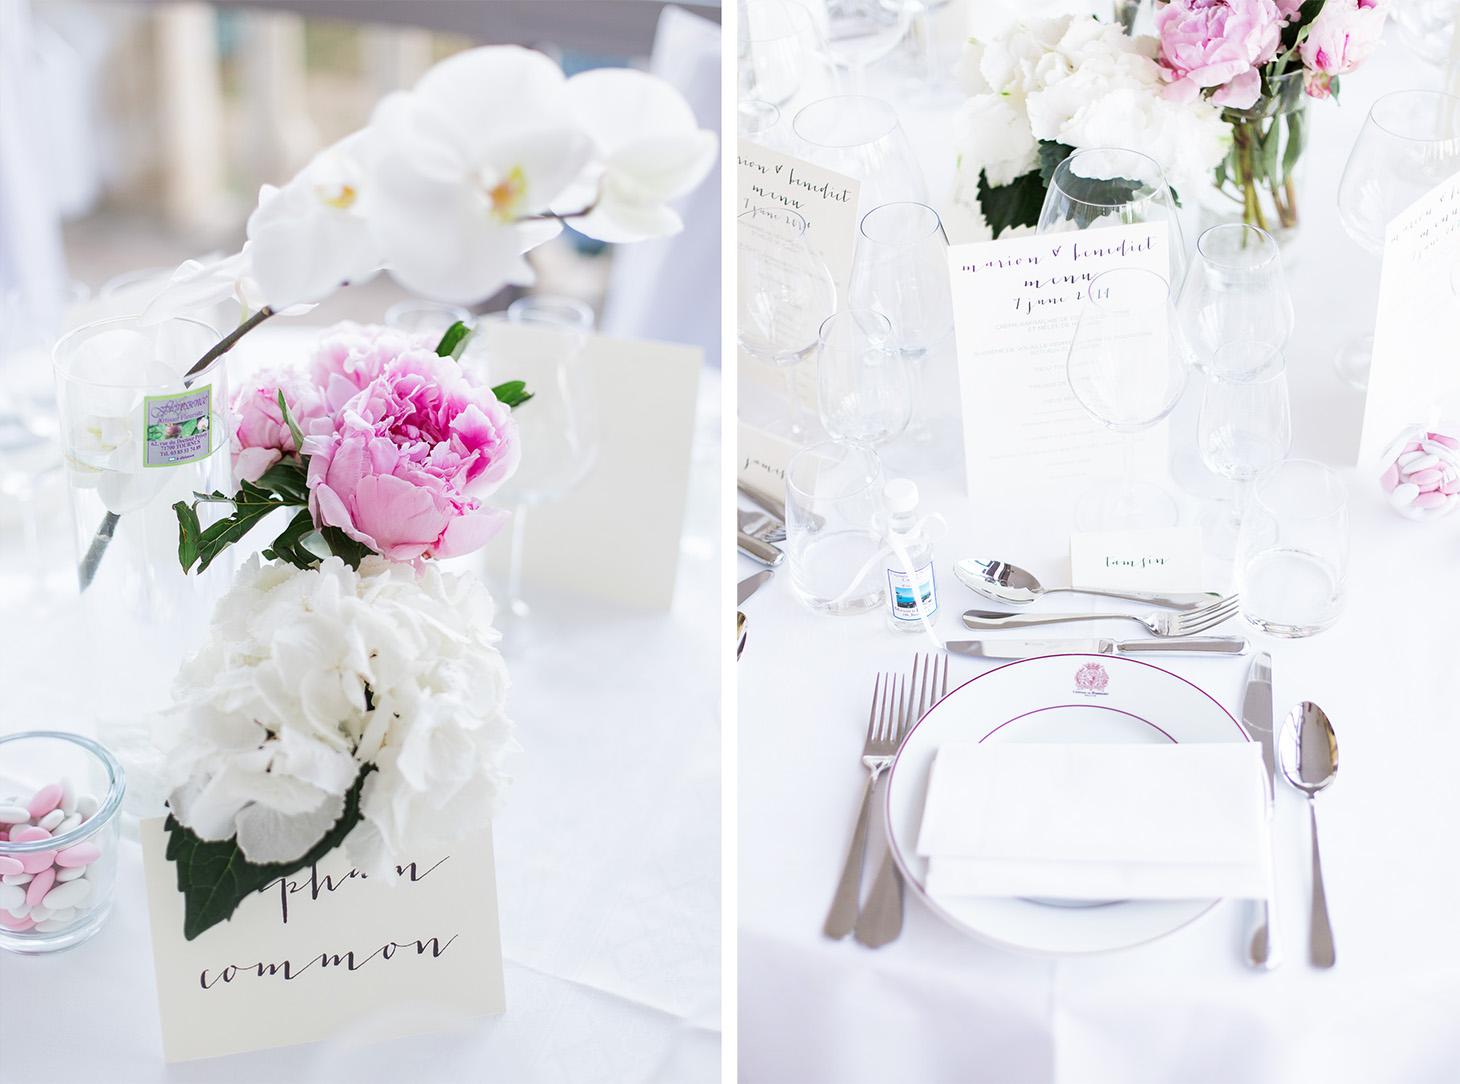 bourgogne_wedding_photographer_chateau_pommard-085 copie